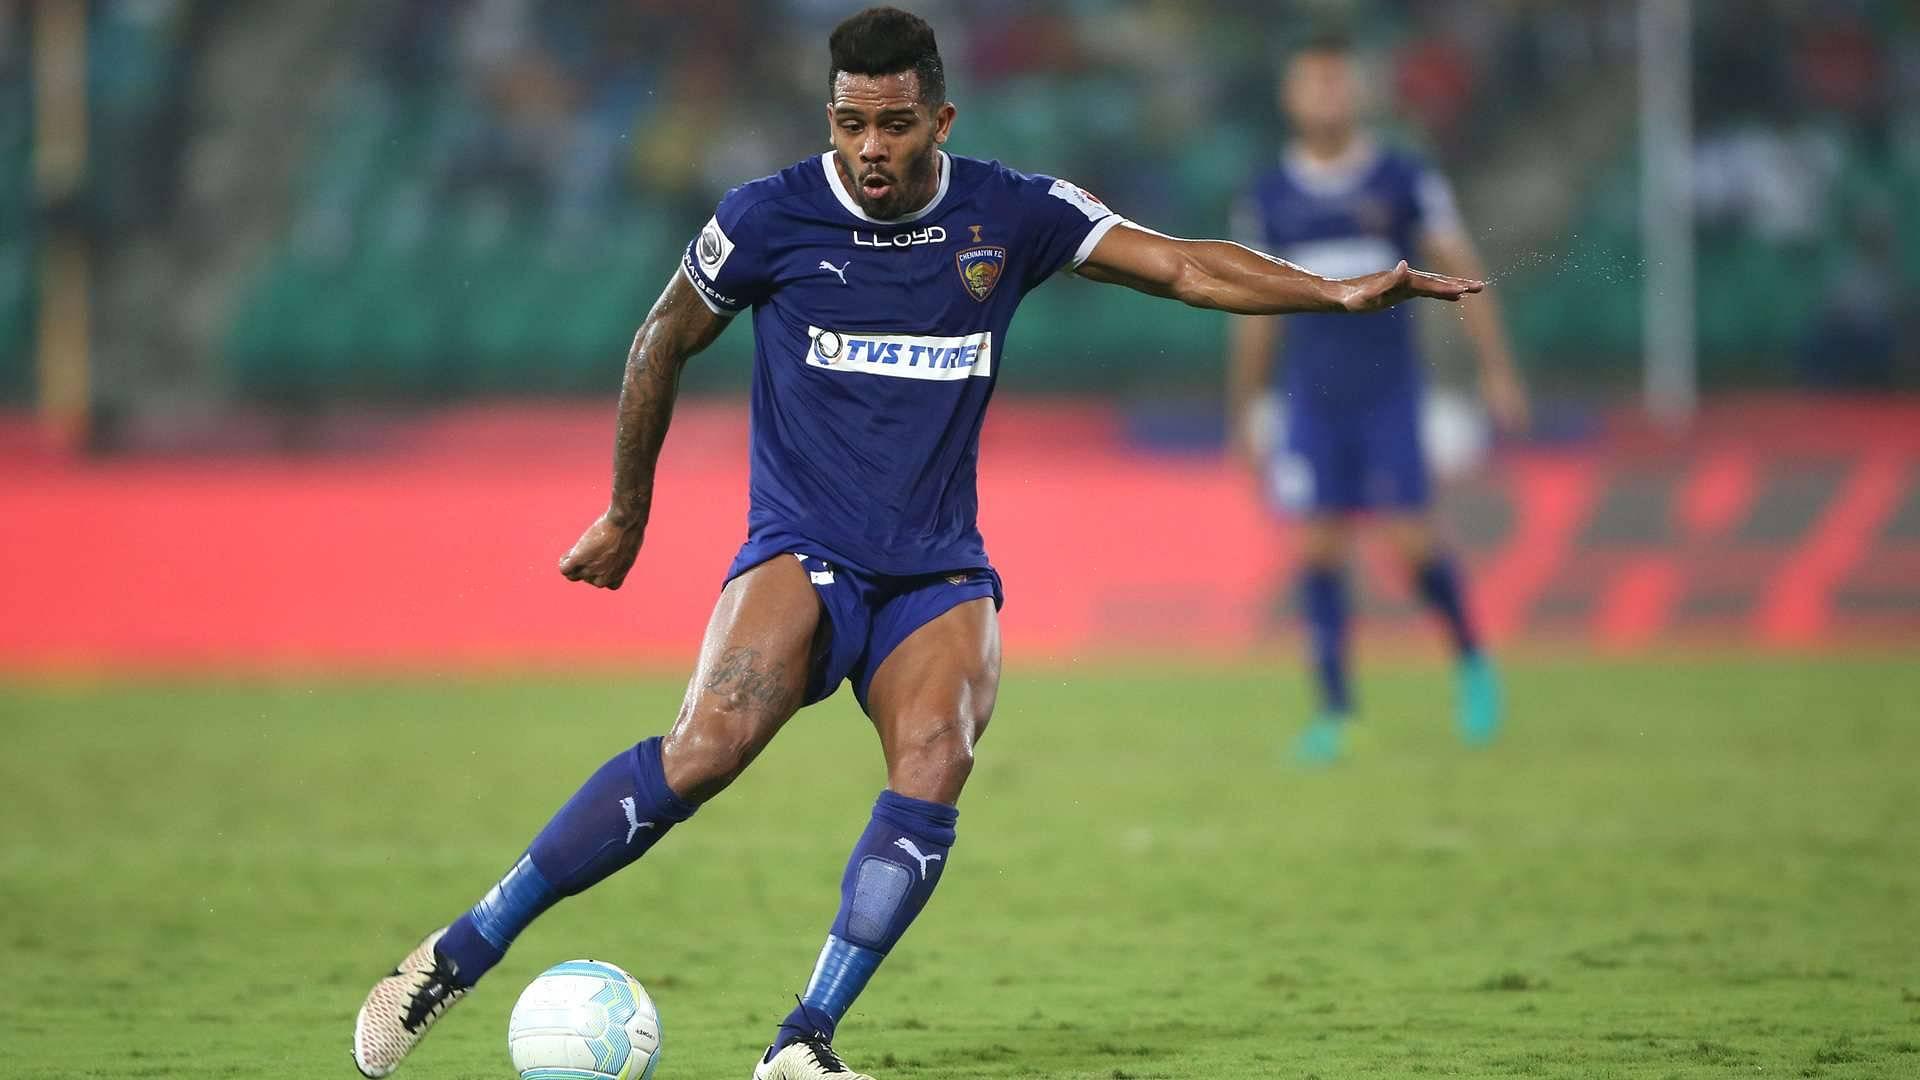 ISL Transfers: Raphael Augusto leaves Chennaiyin FC